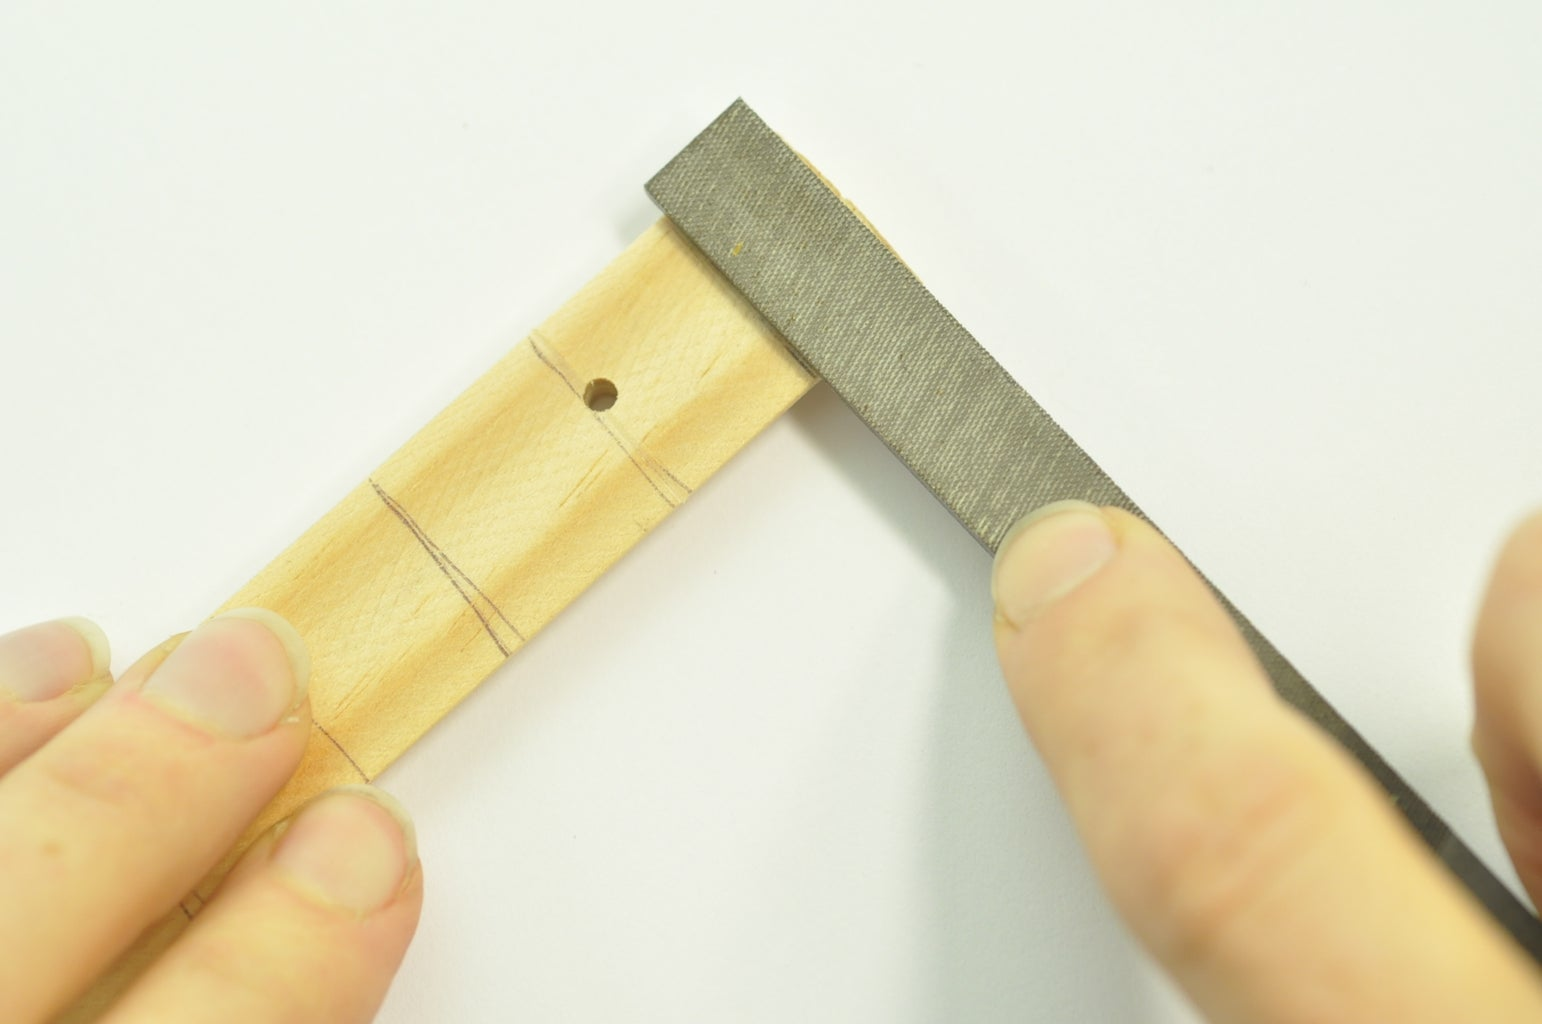 Prepare the Wooden Strips